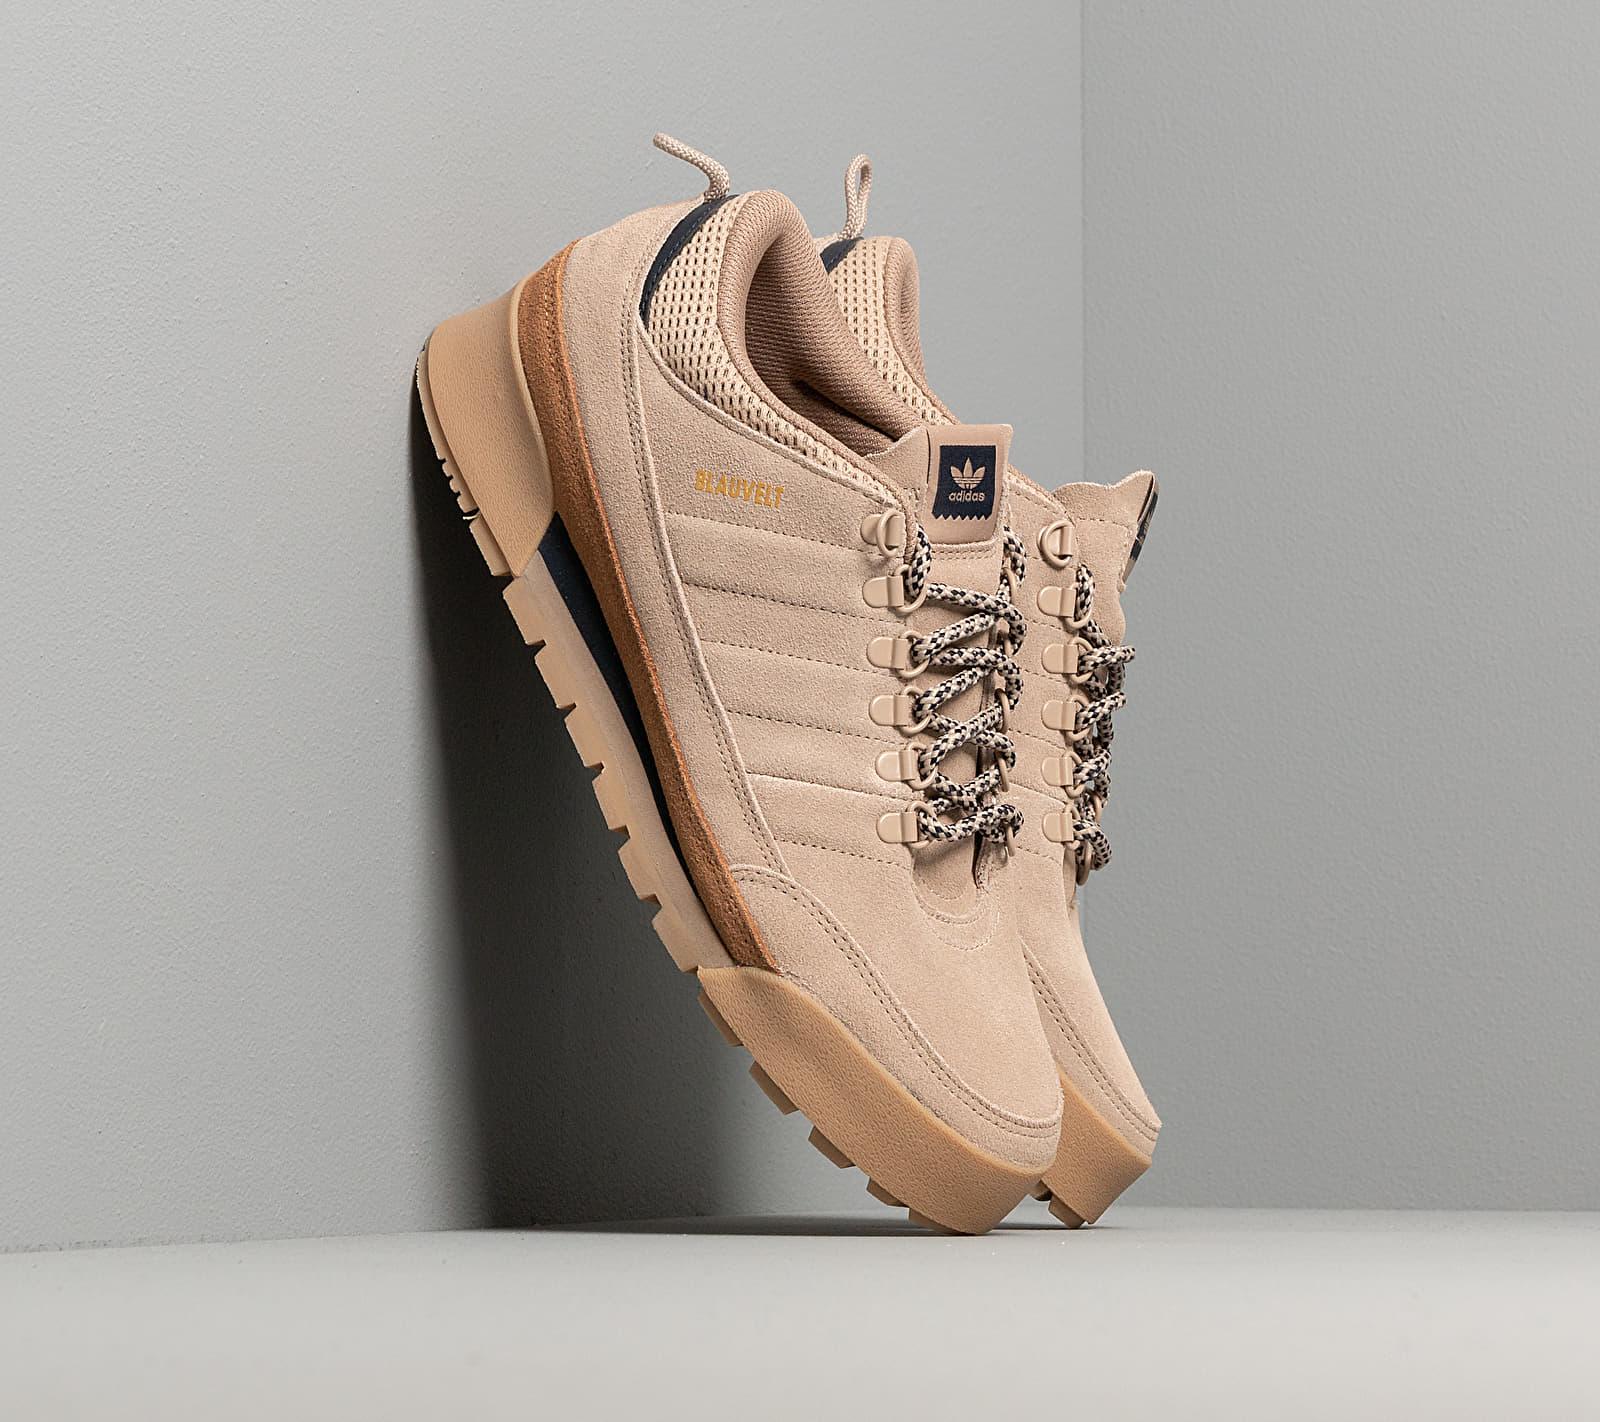 adidas Jake Boot 2.0 Low Trace Khaki/ Raw Desert/ Legink EE6210